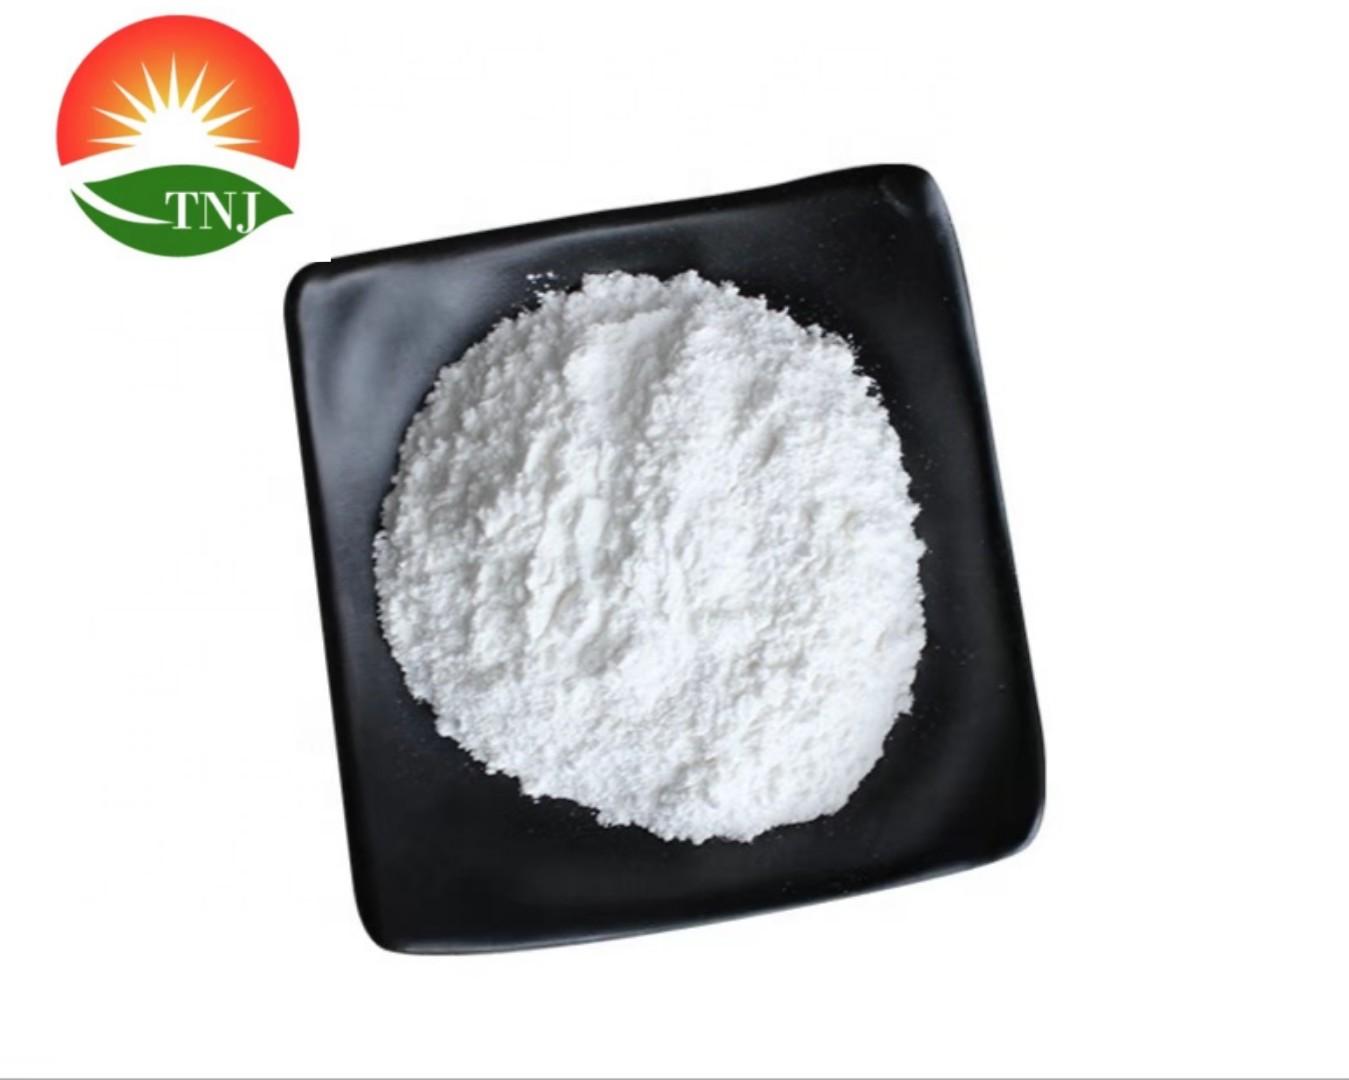 High purity Enoxaparin sodium Heparin 679809-58-6